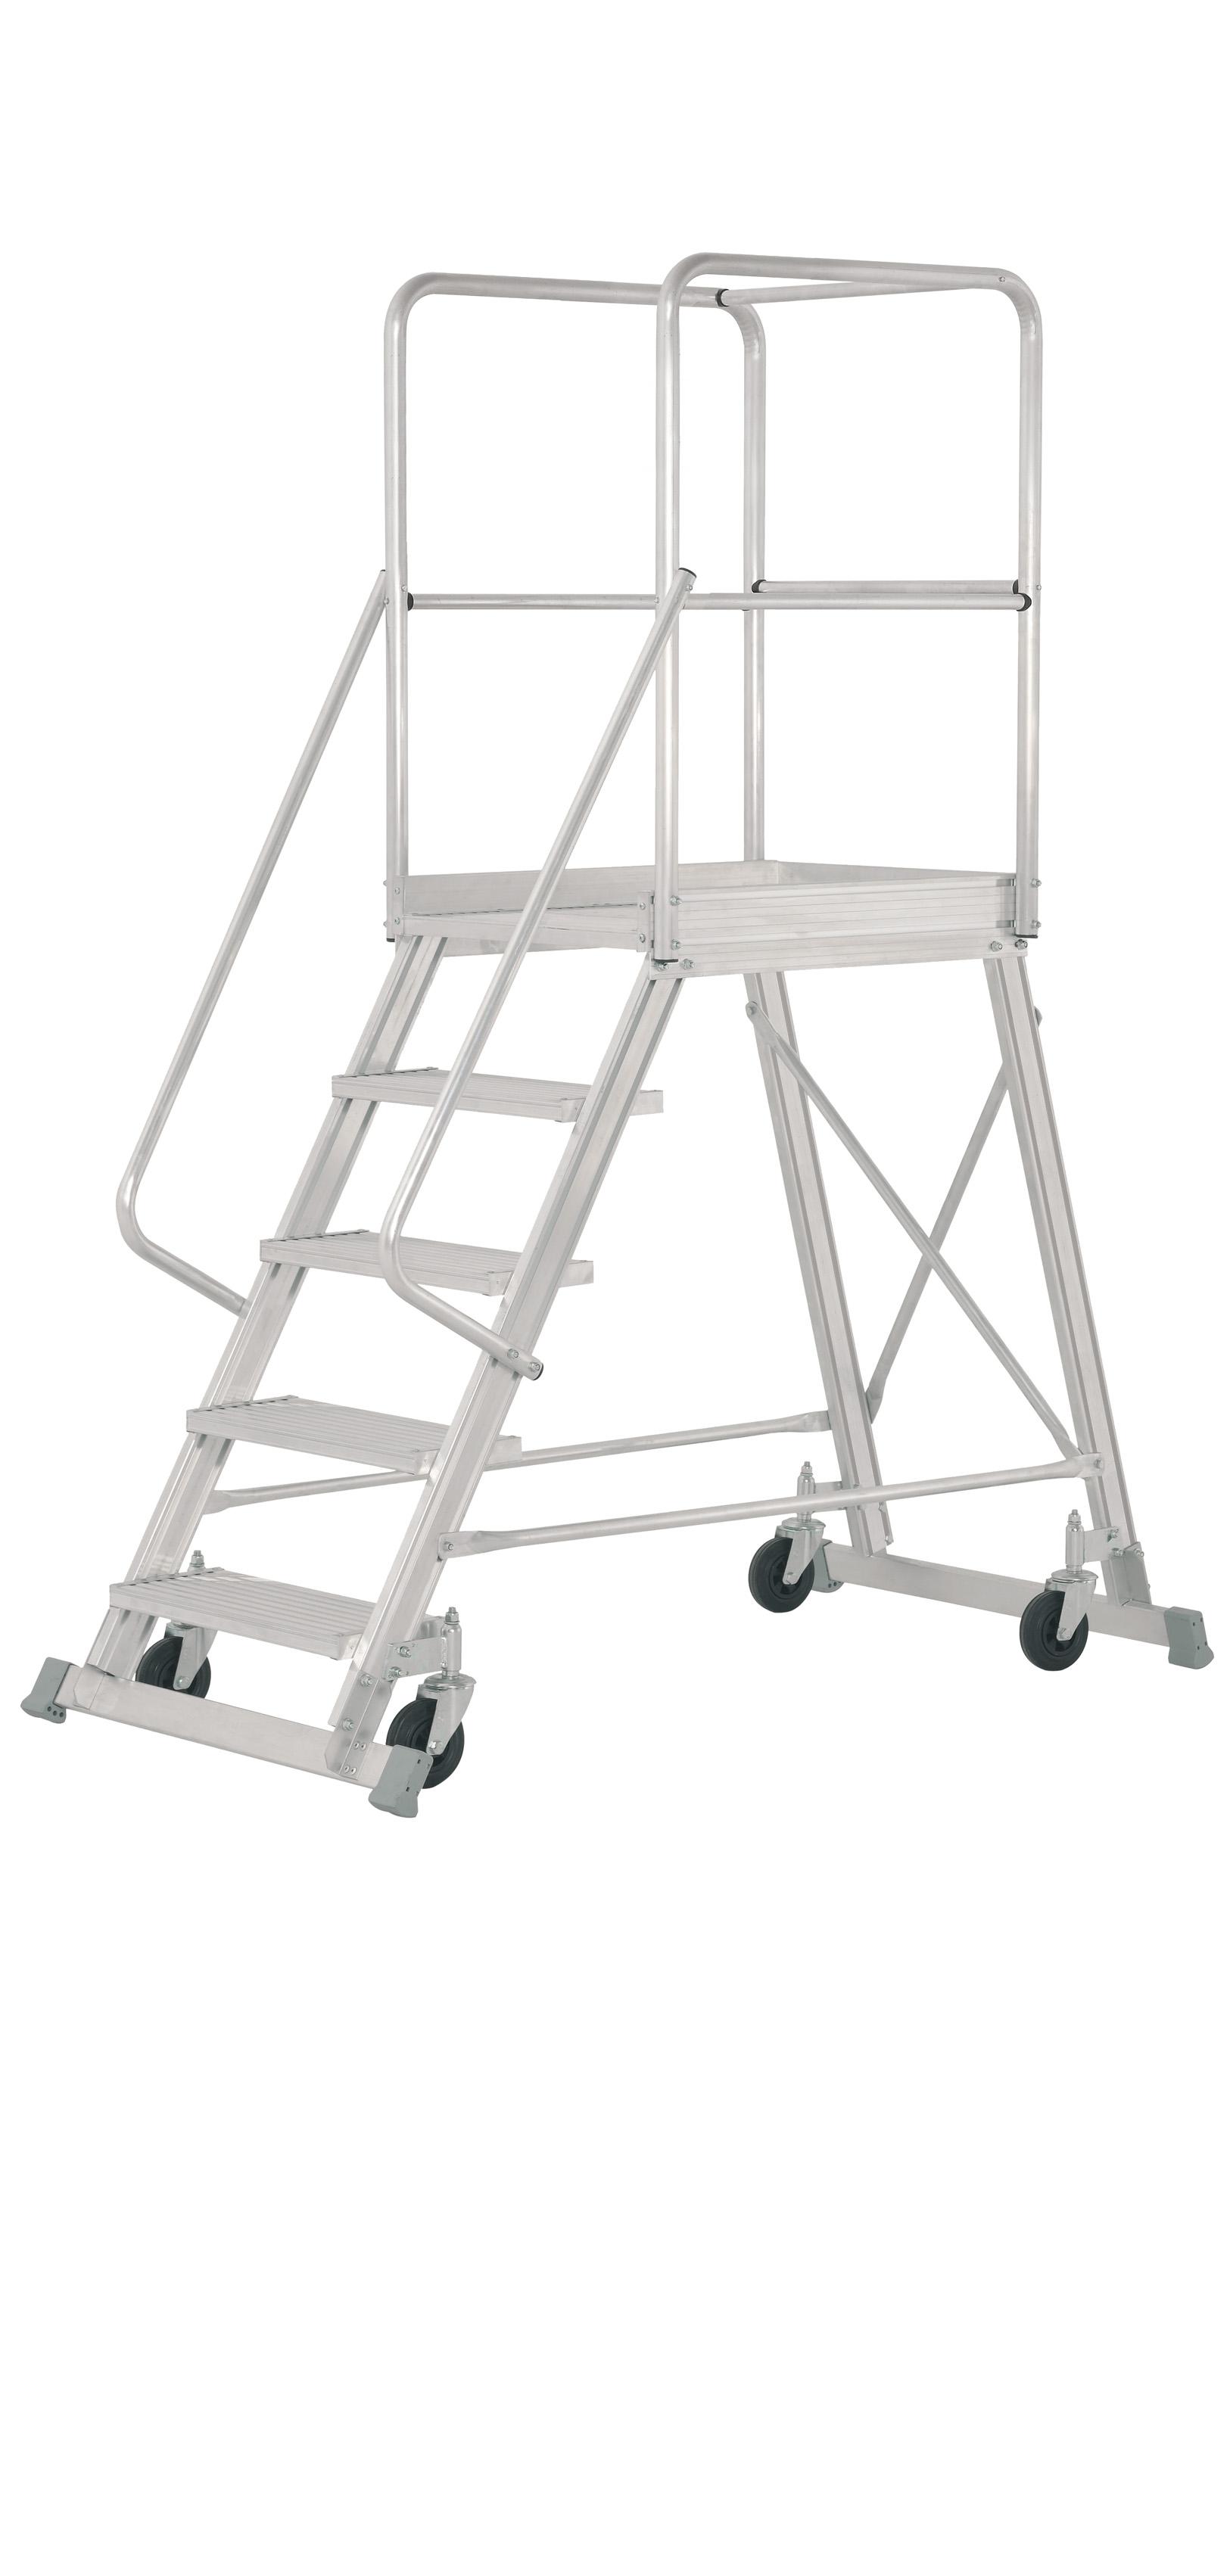 chelle plate forme roulante en aluminium escaleras arizona. Black Bedroom Furniture Sets. Home Design Ideas